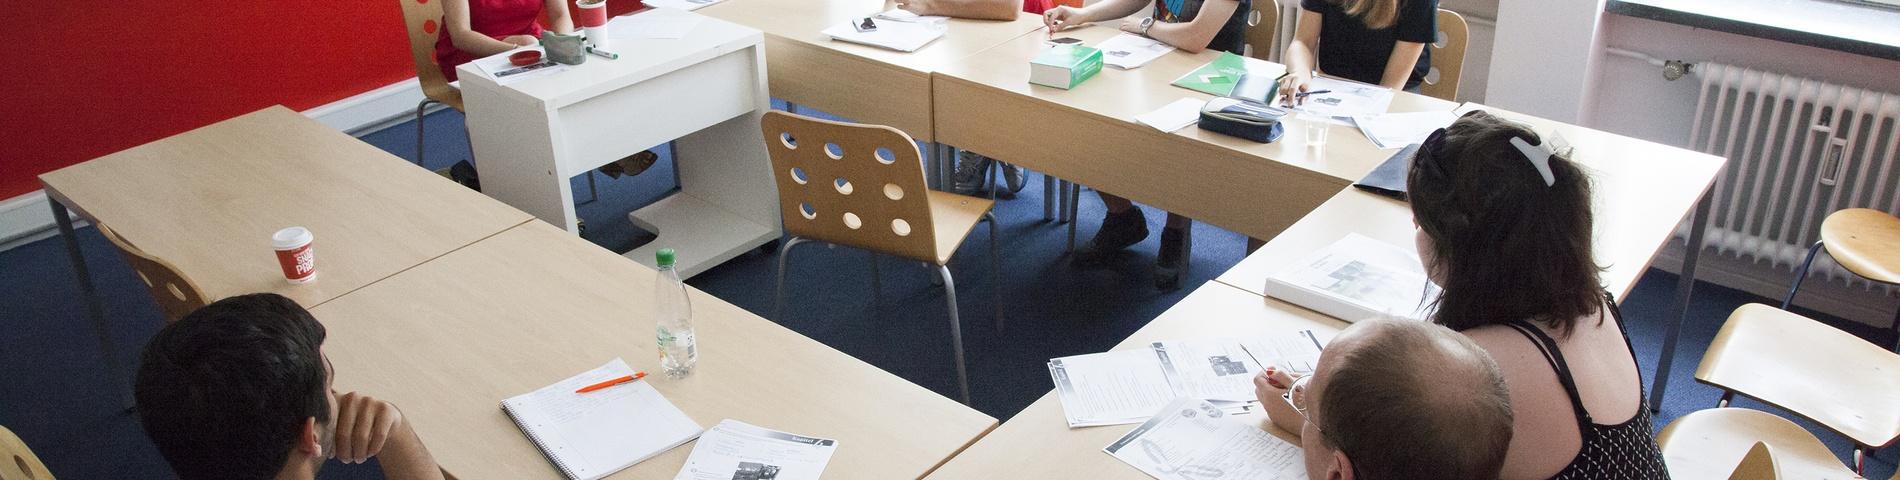 Berlin Sprachschule obrazek 1